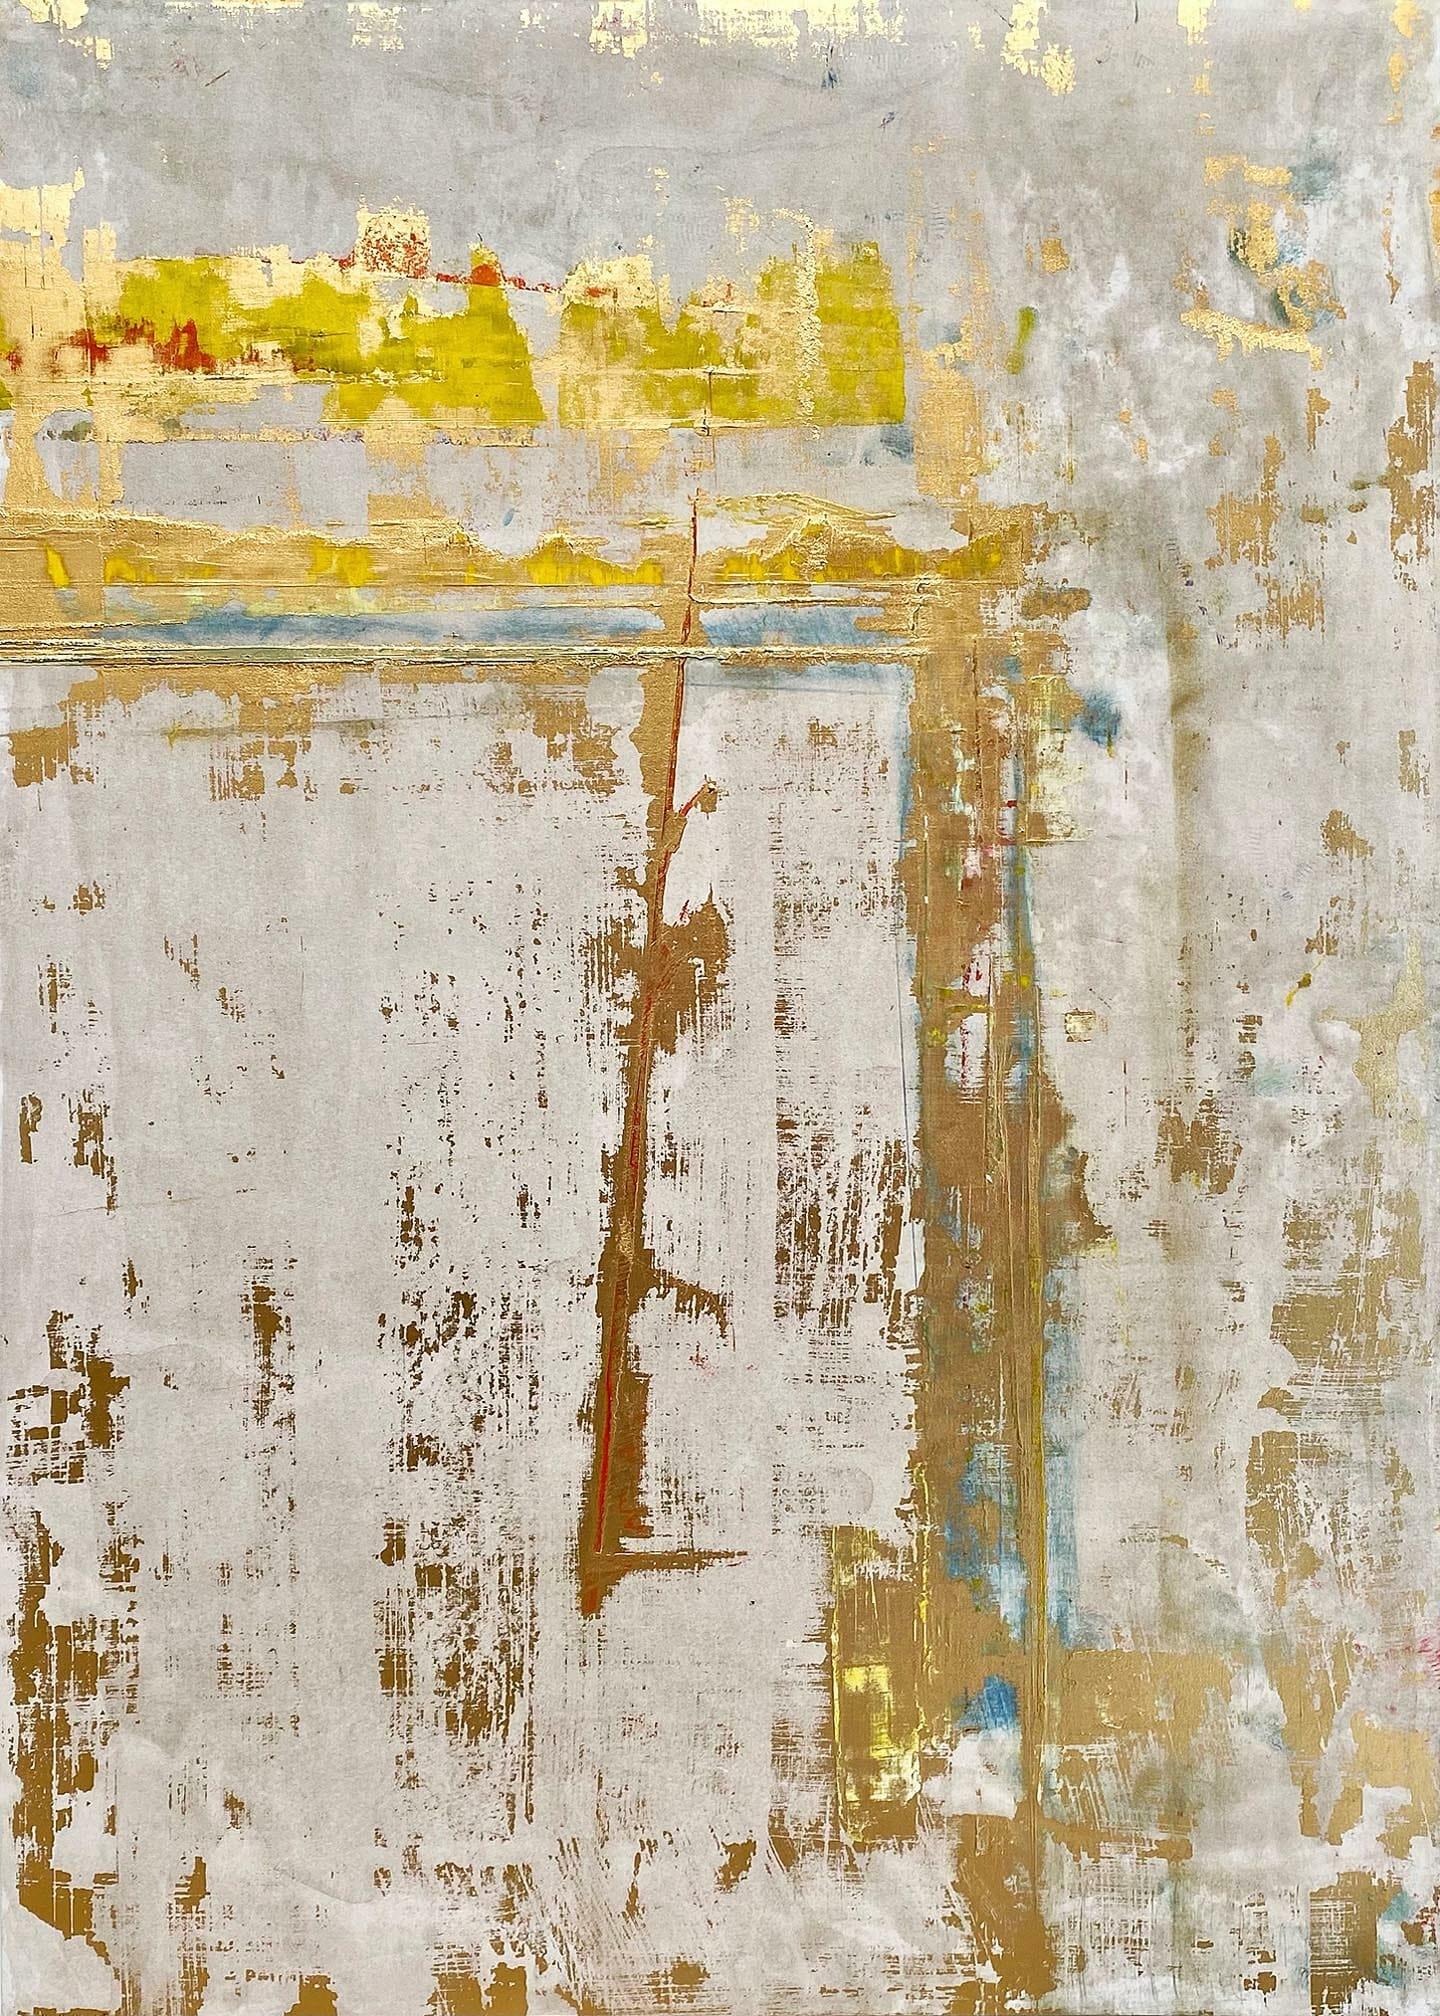 Art, Kunst, Heiland, Erlöser, savior, Retter, König, saviours, king, redeemer, monochrome, Öl, Oil, Bunt, color, Spachteltechnik, Papier, paper, squeegee, modern, Gemälde, artwork, studio, Atelier, gallery, gold